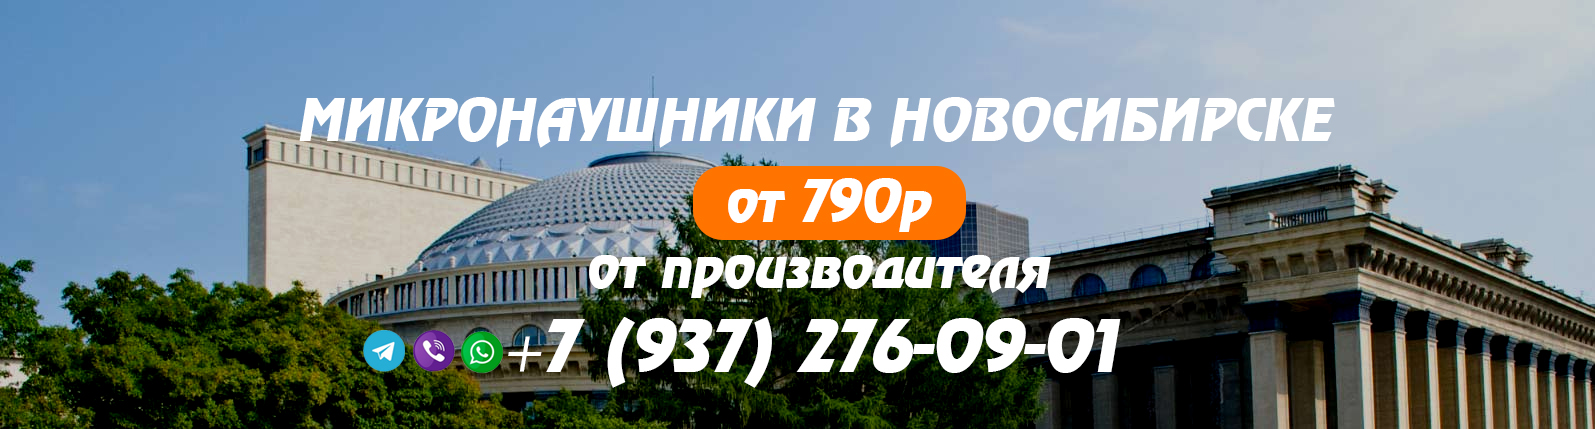 mikronaushniki-novosibirsk